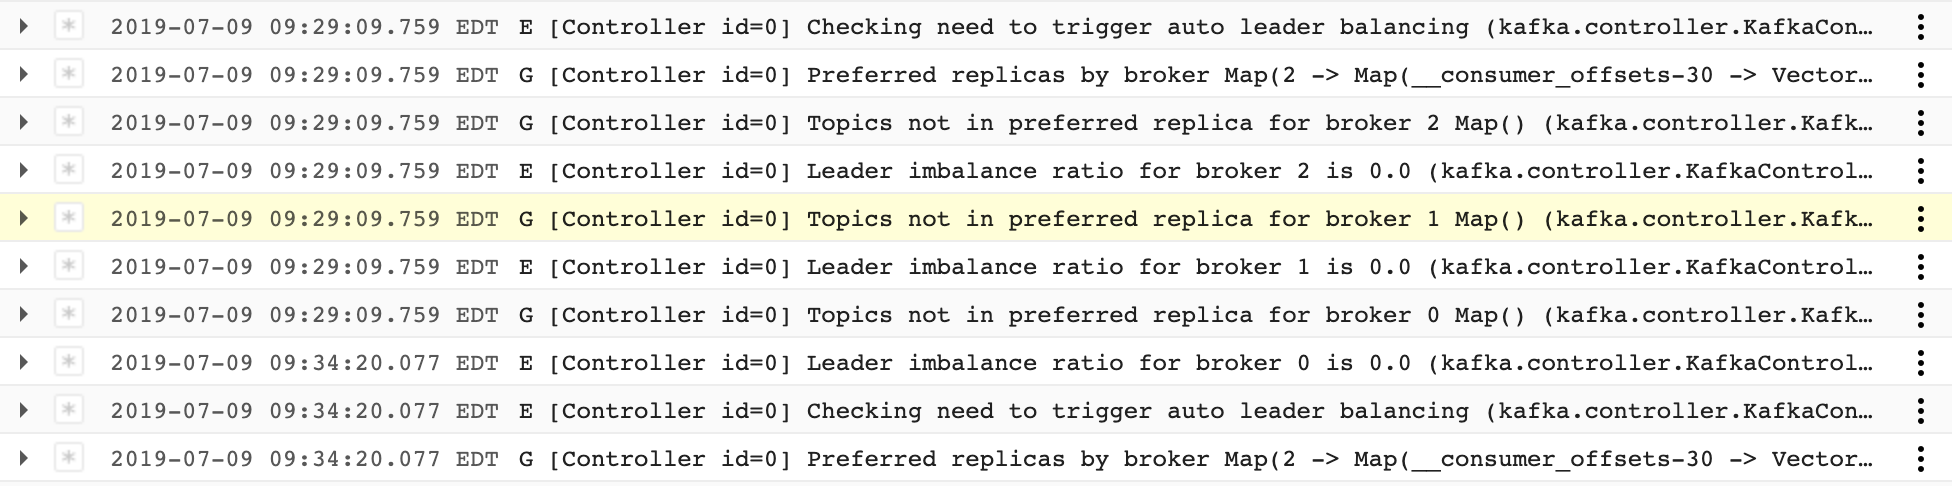 Apache Kafka Controller Logs Example